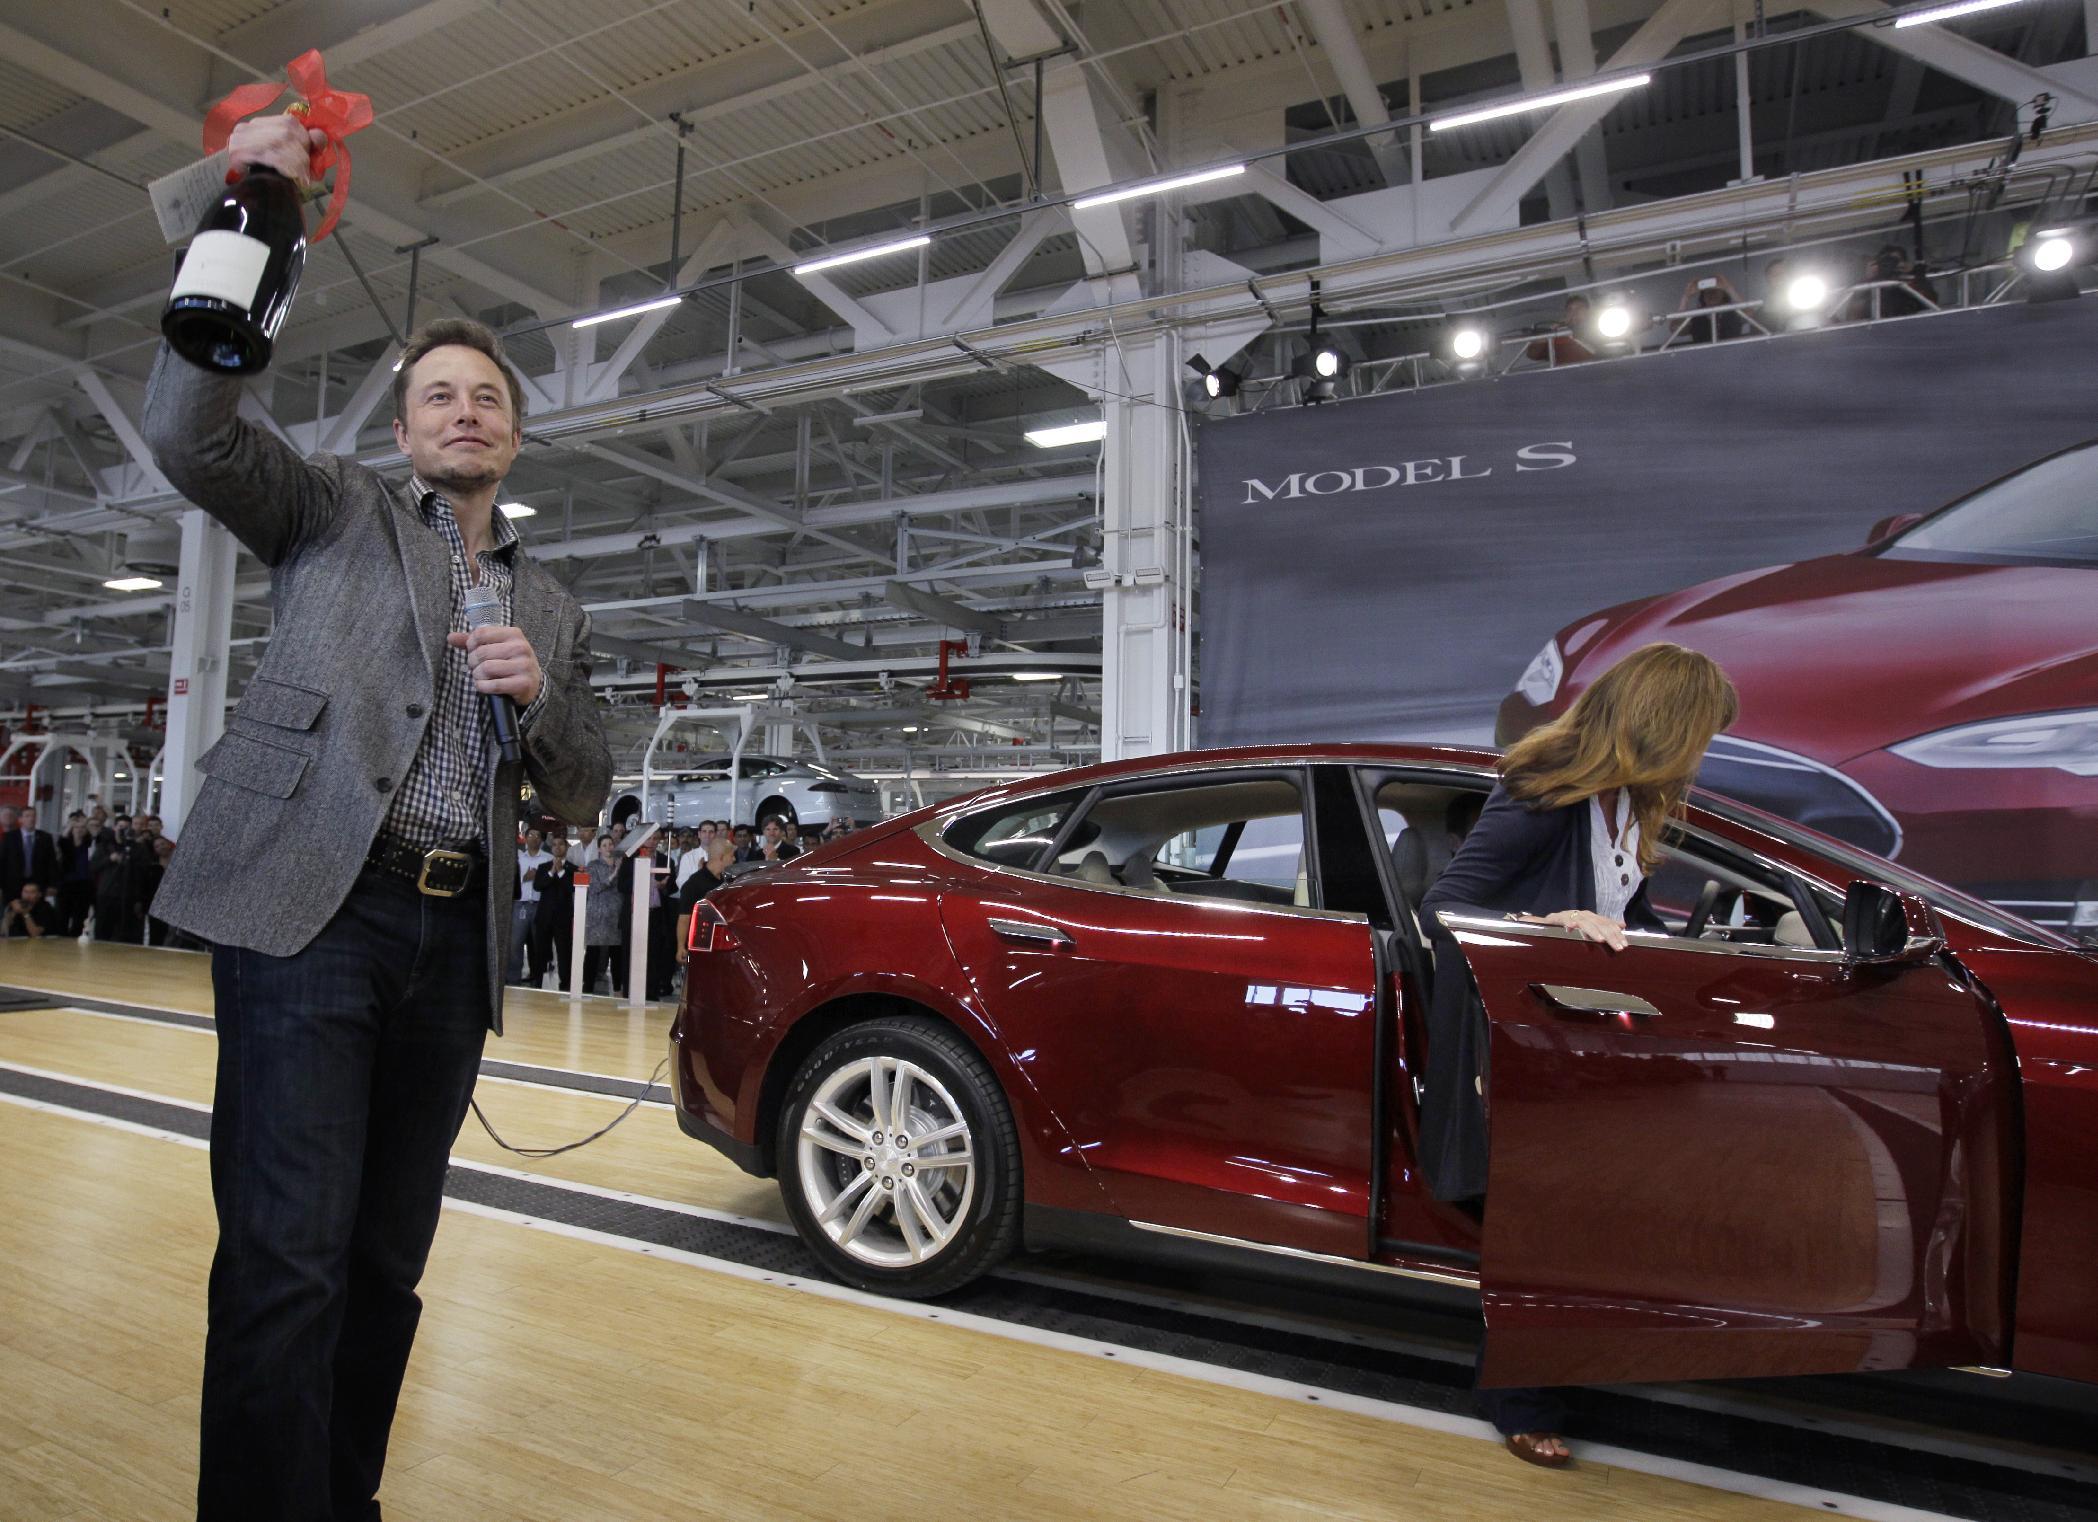 Tesla Motors Inc. CEO Elon Musk holds up a bottle of wine